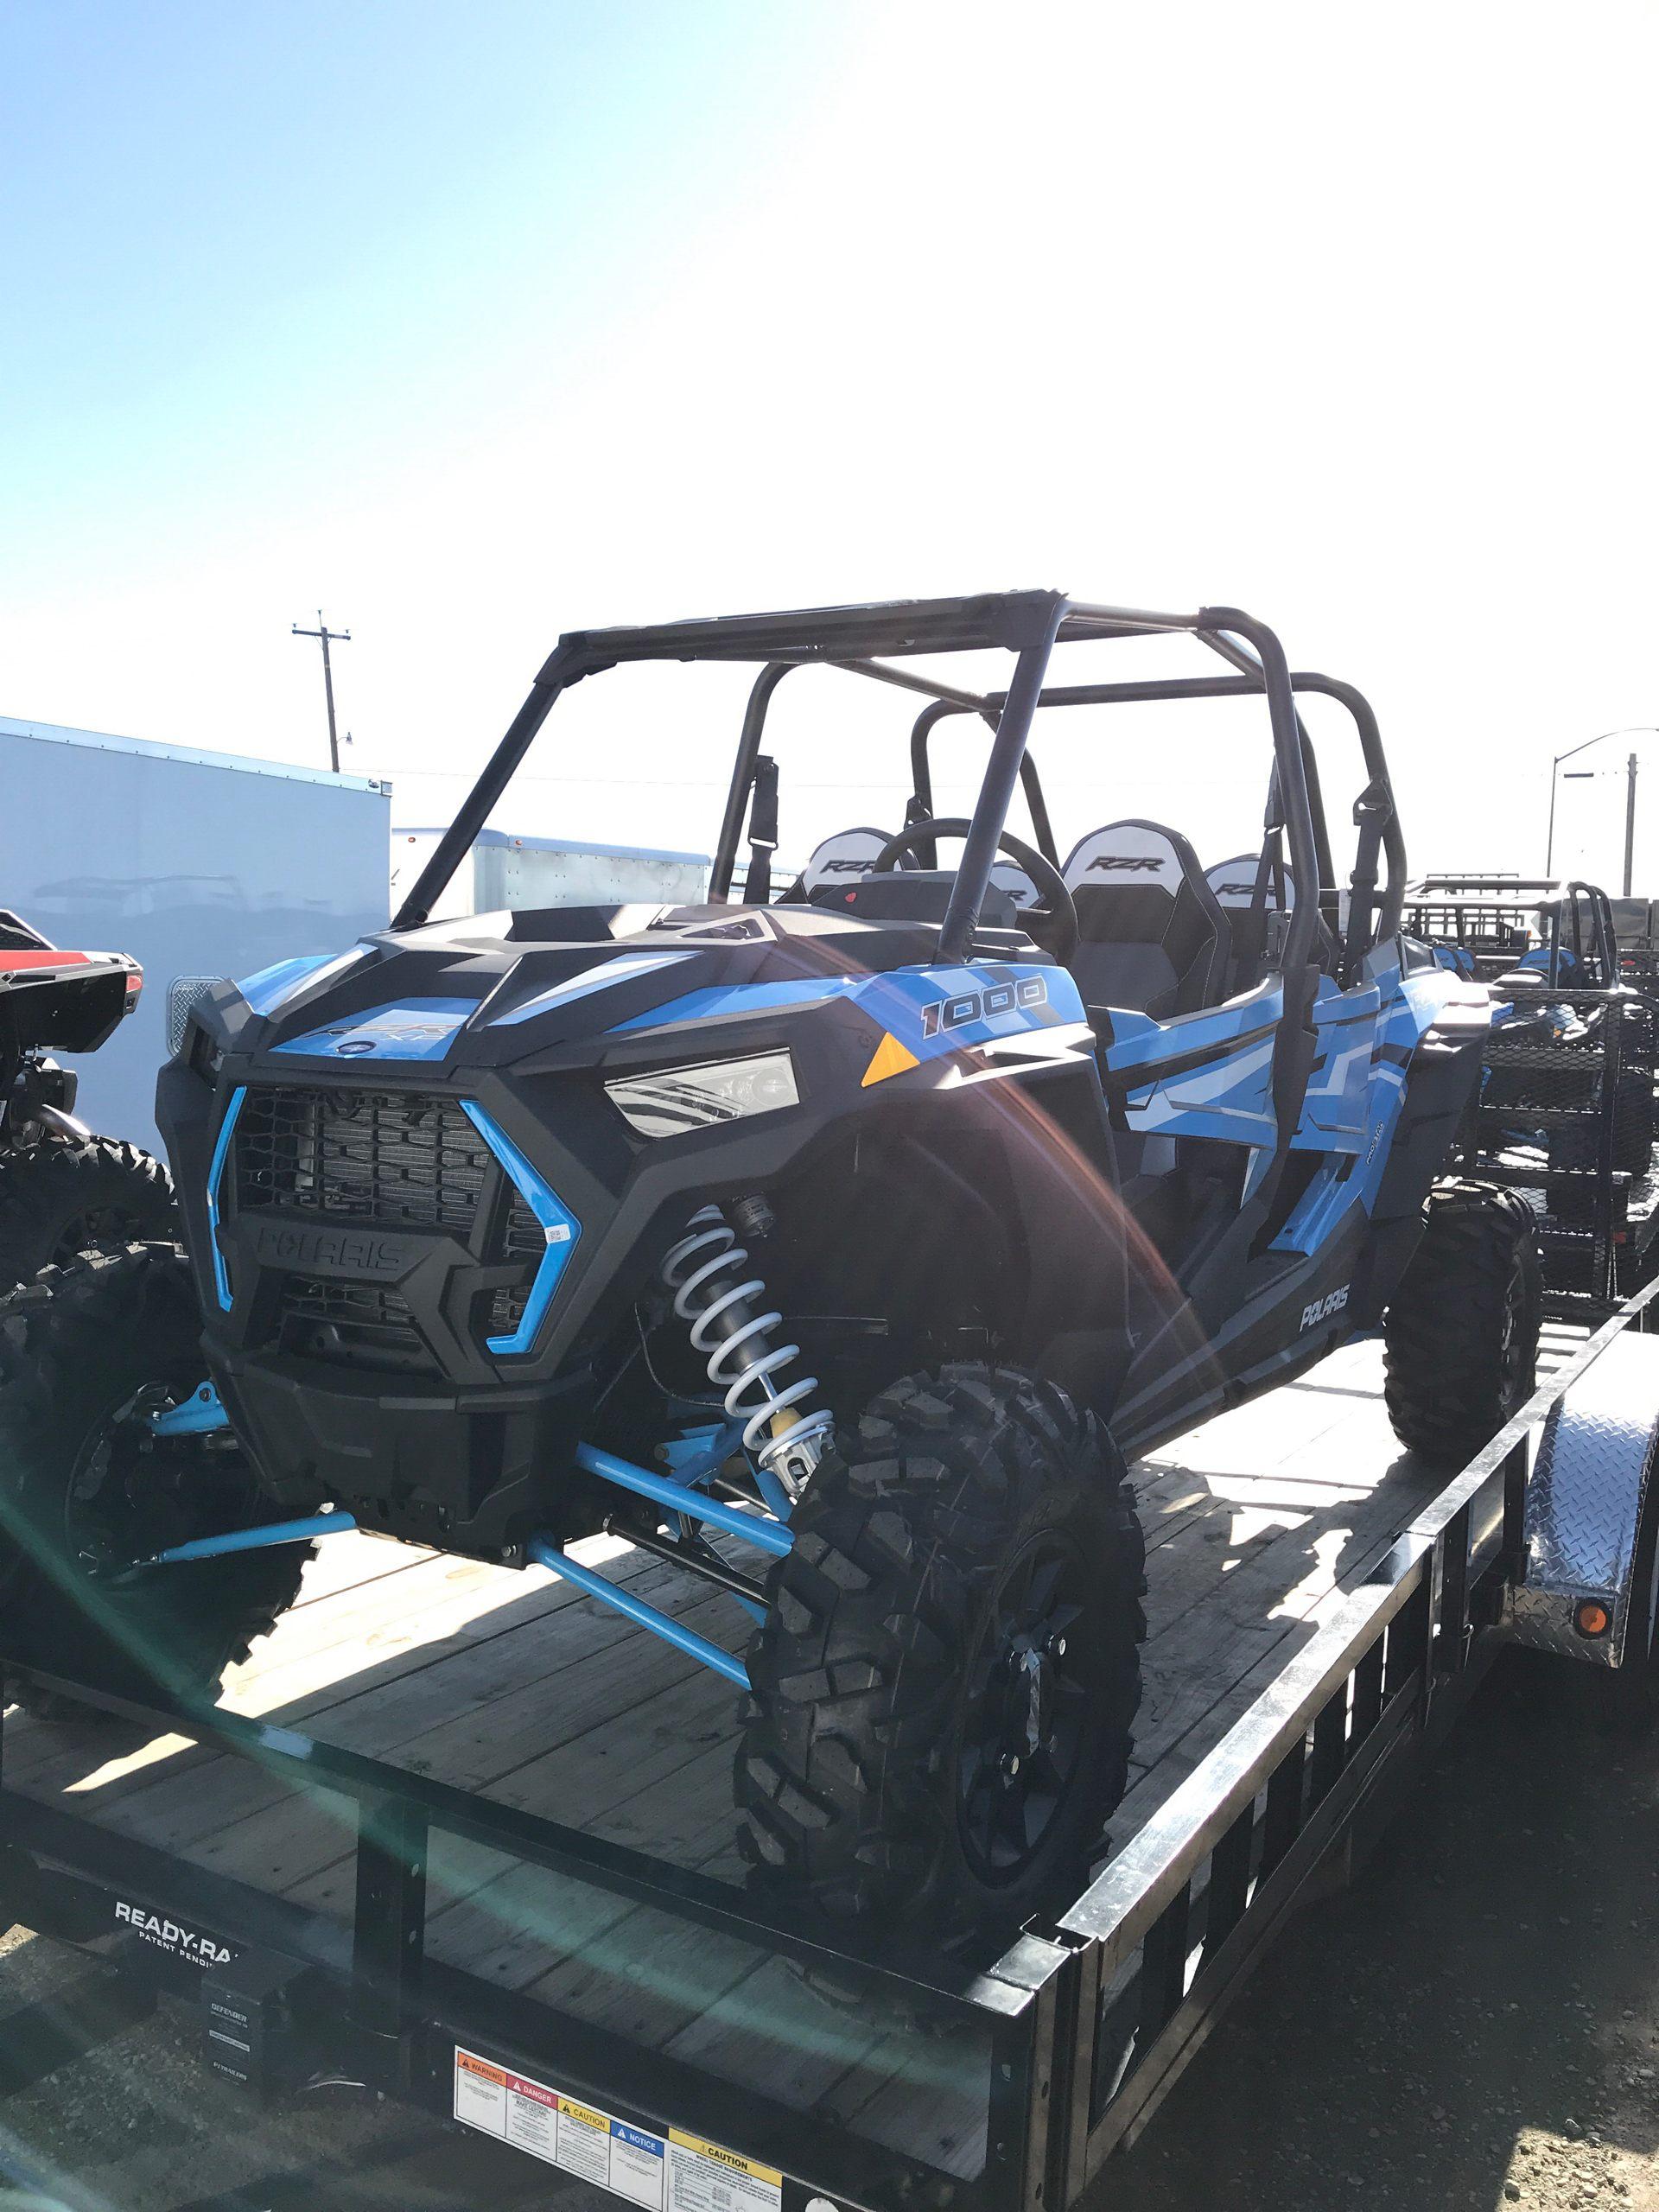 2019 Polaris RZR XP 4 1000 EPS in Elk Grove, California